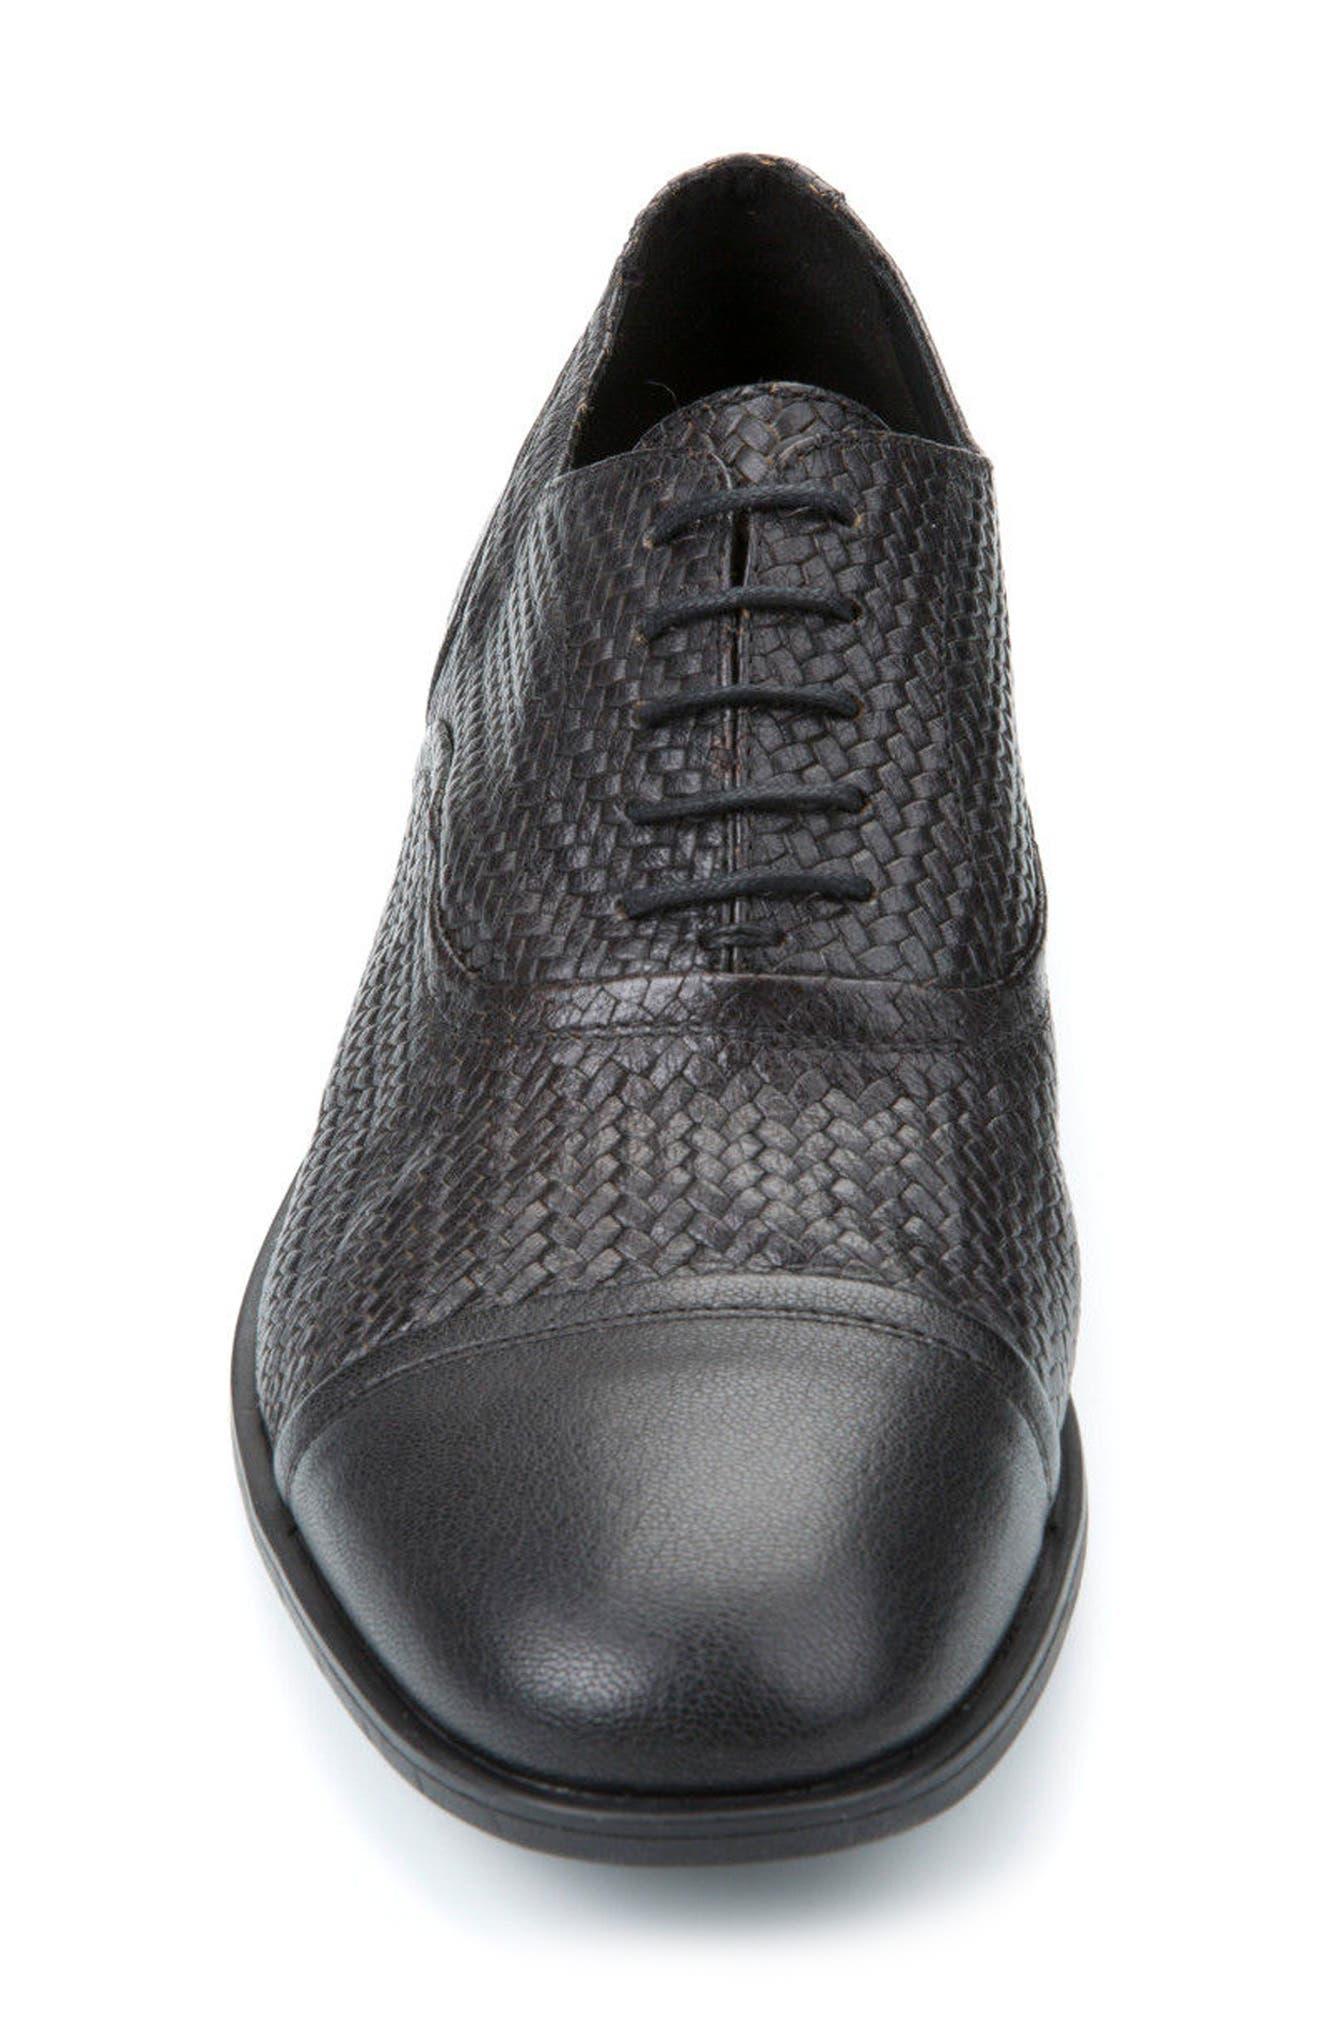 Bryceton Textured Cap Toe Oxford,                             Alternate thumbnail 4, color,                             BLACK LEATHER